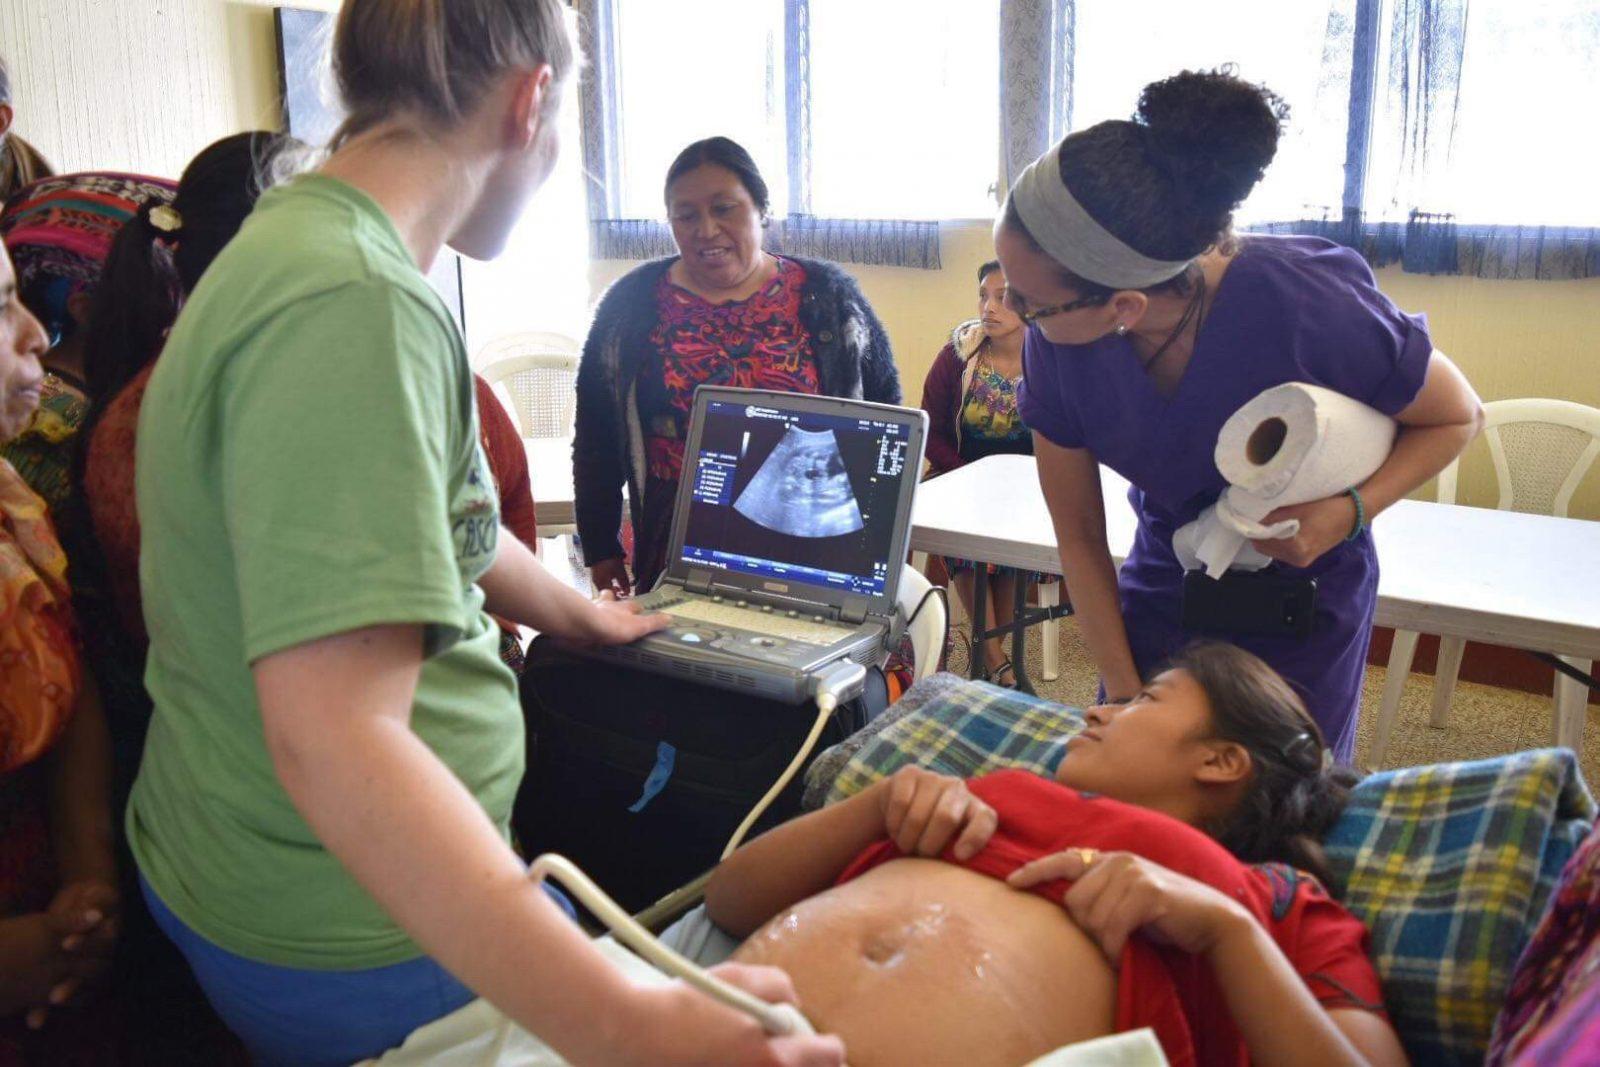 Ultrasound with Ge Logiq e OB-GYN ultrasound